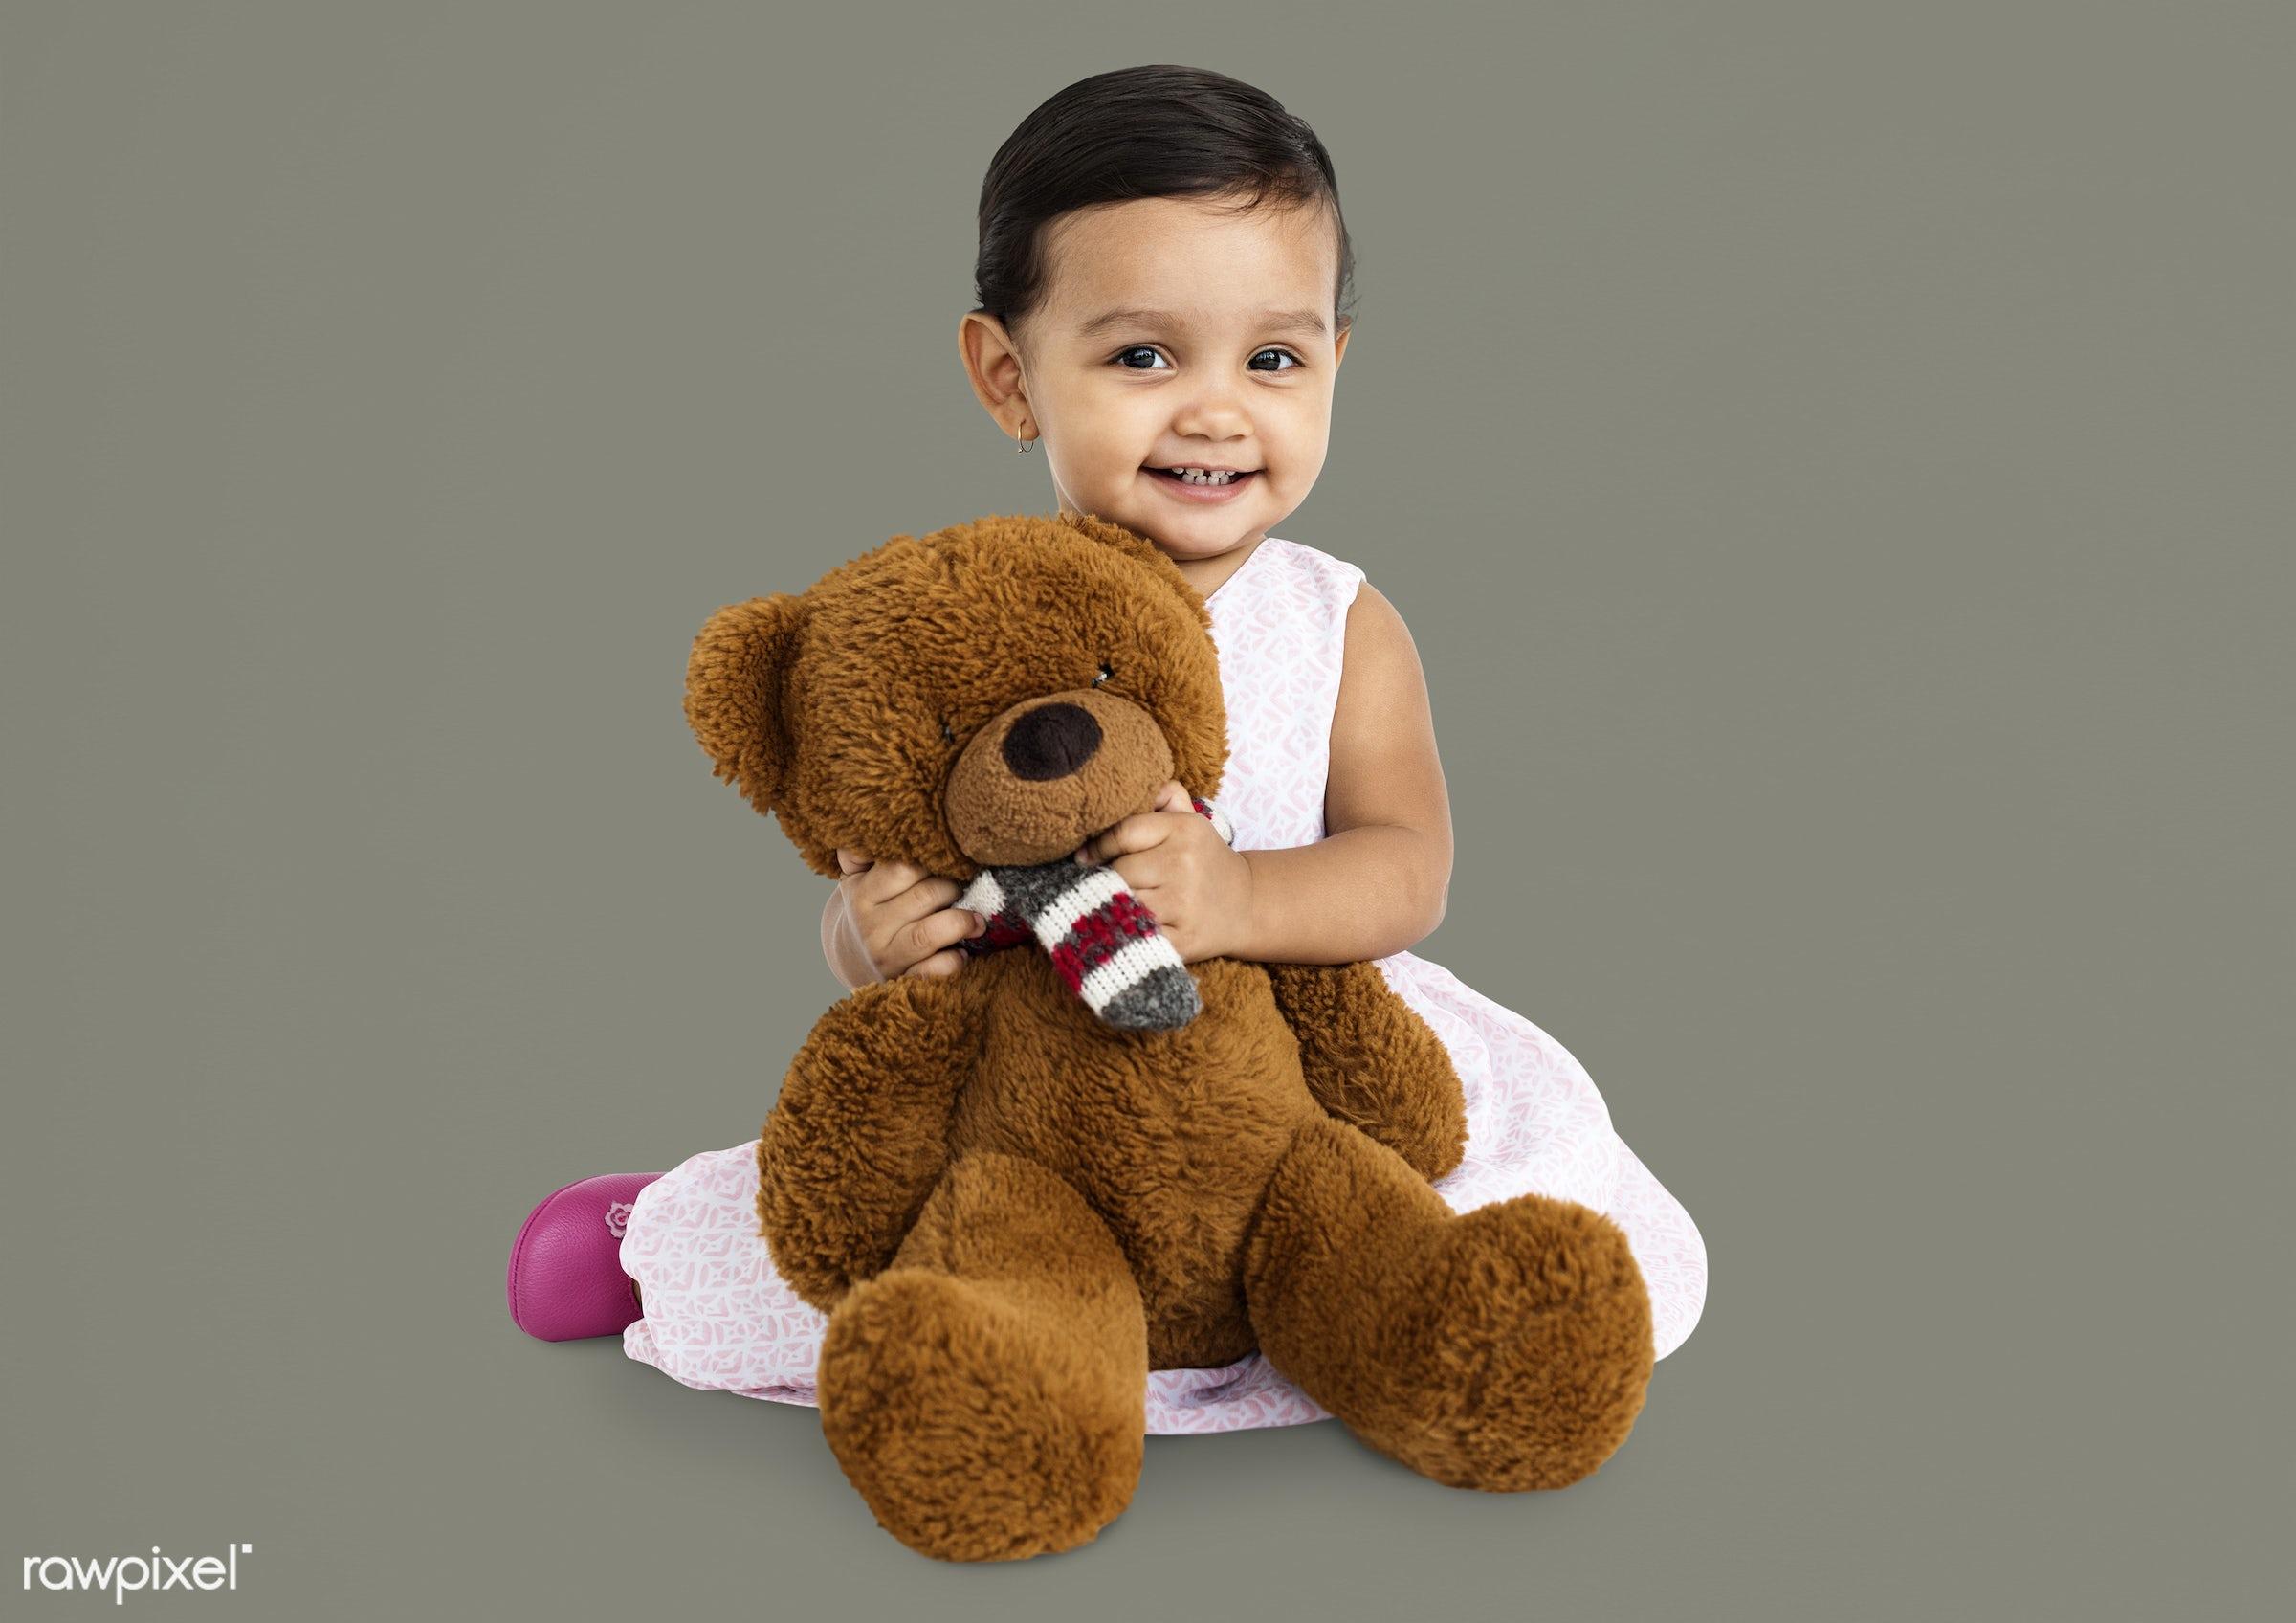 expression, studio, person, hug, soft toy, teddybear, little, cute, people, kid, child, girl, toy, joyous, happy, cheerful,...